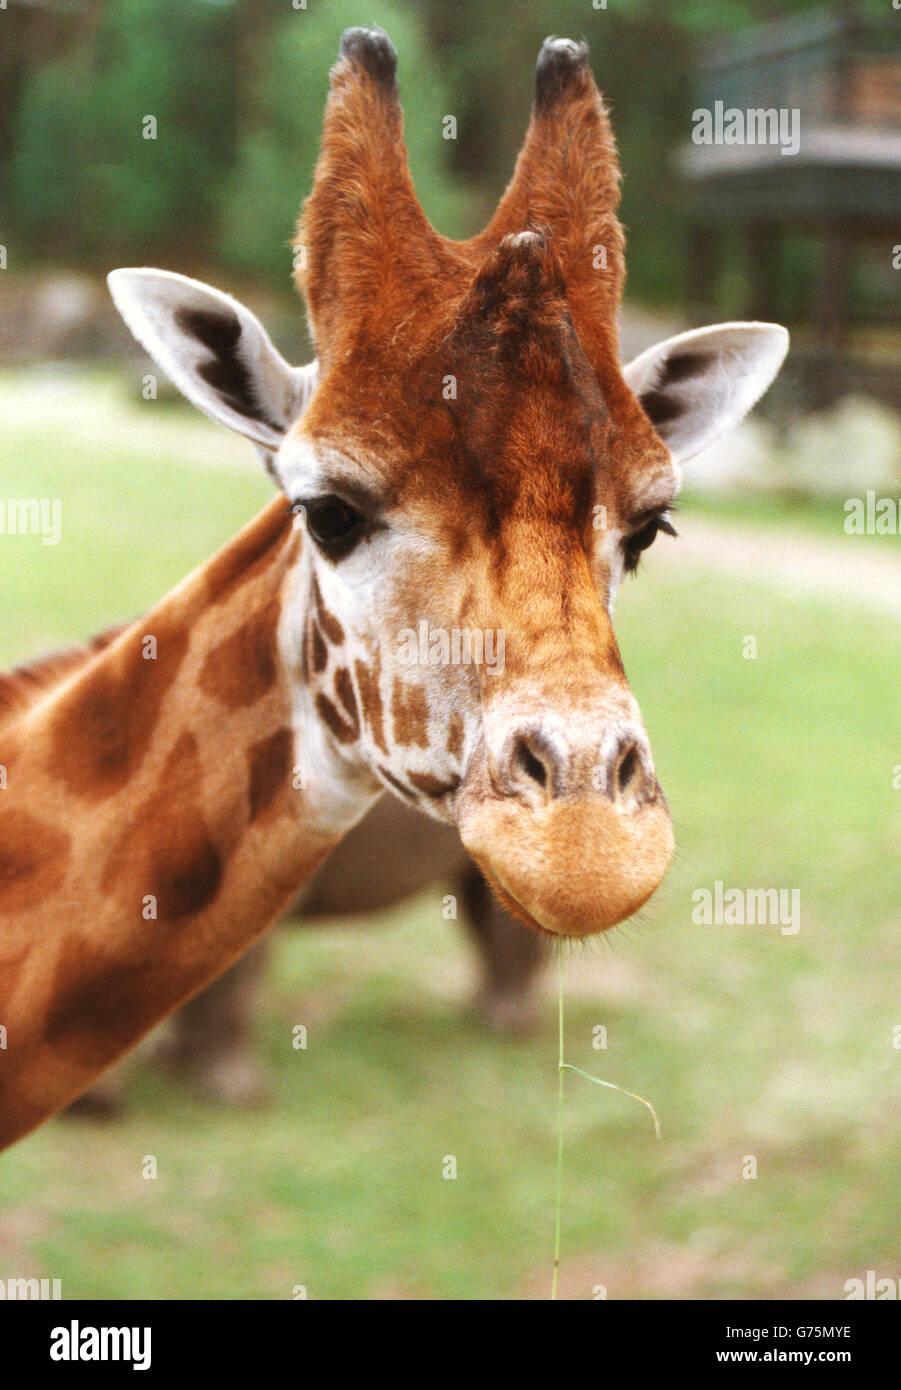 Giraffe at the Zoo - Stock Image